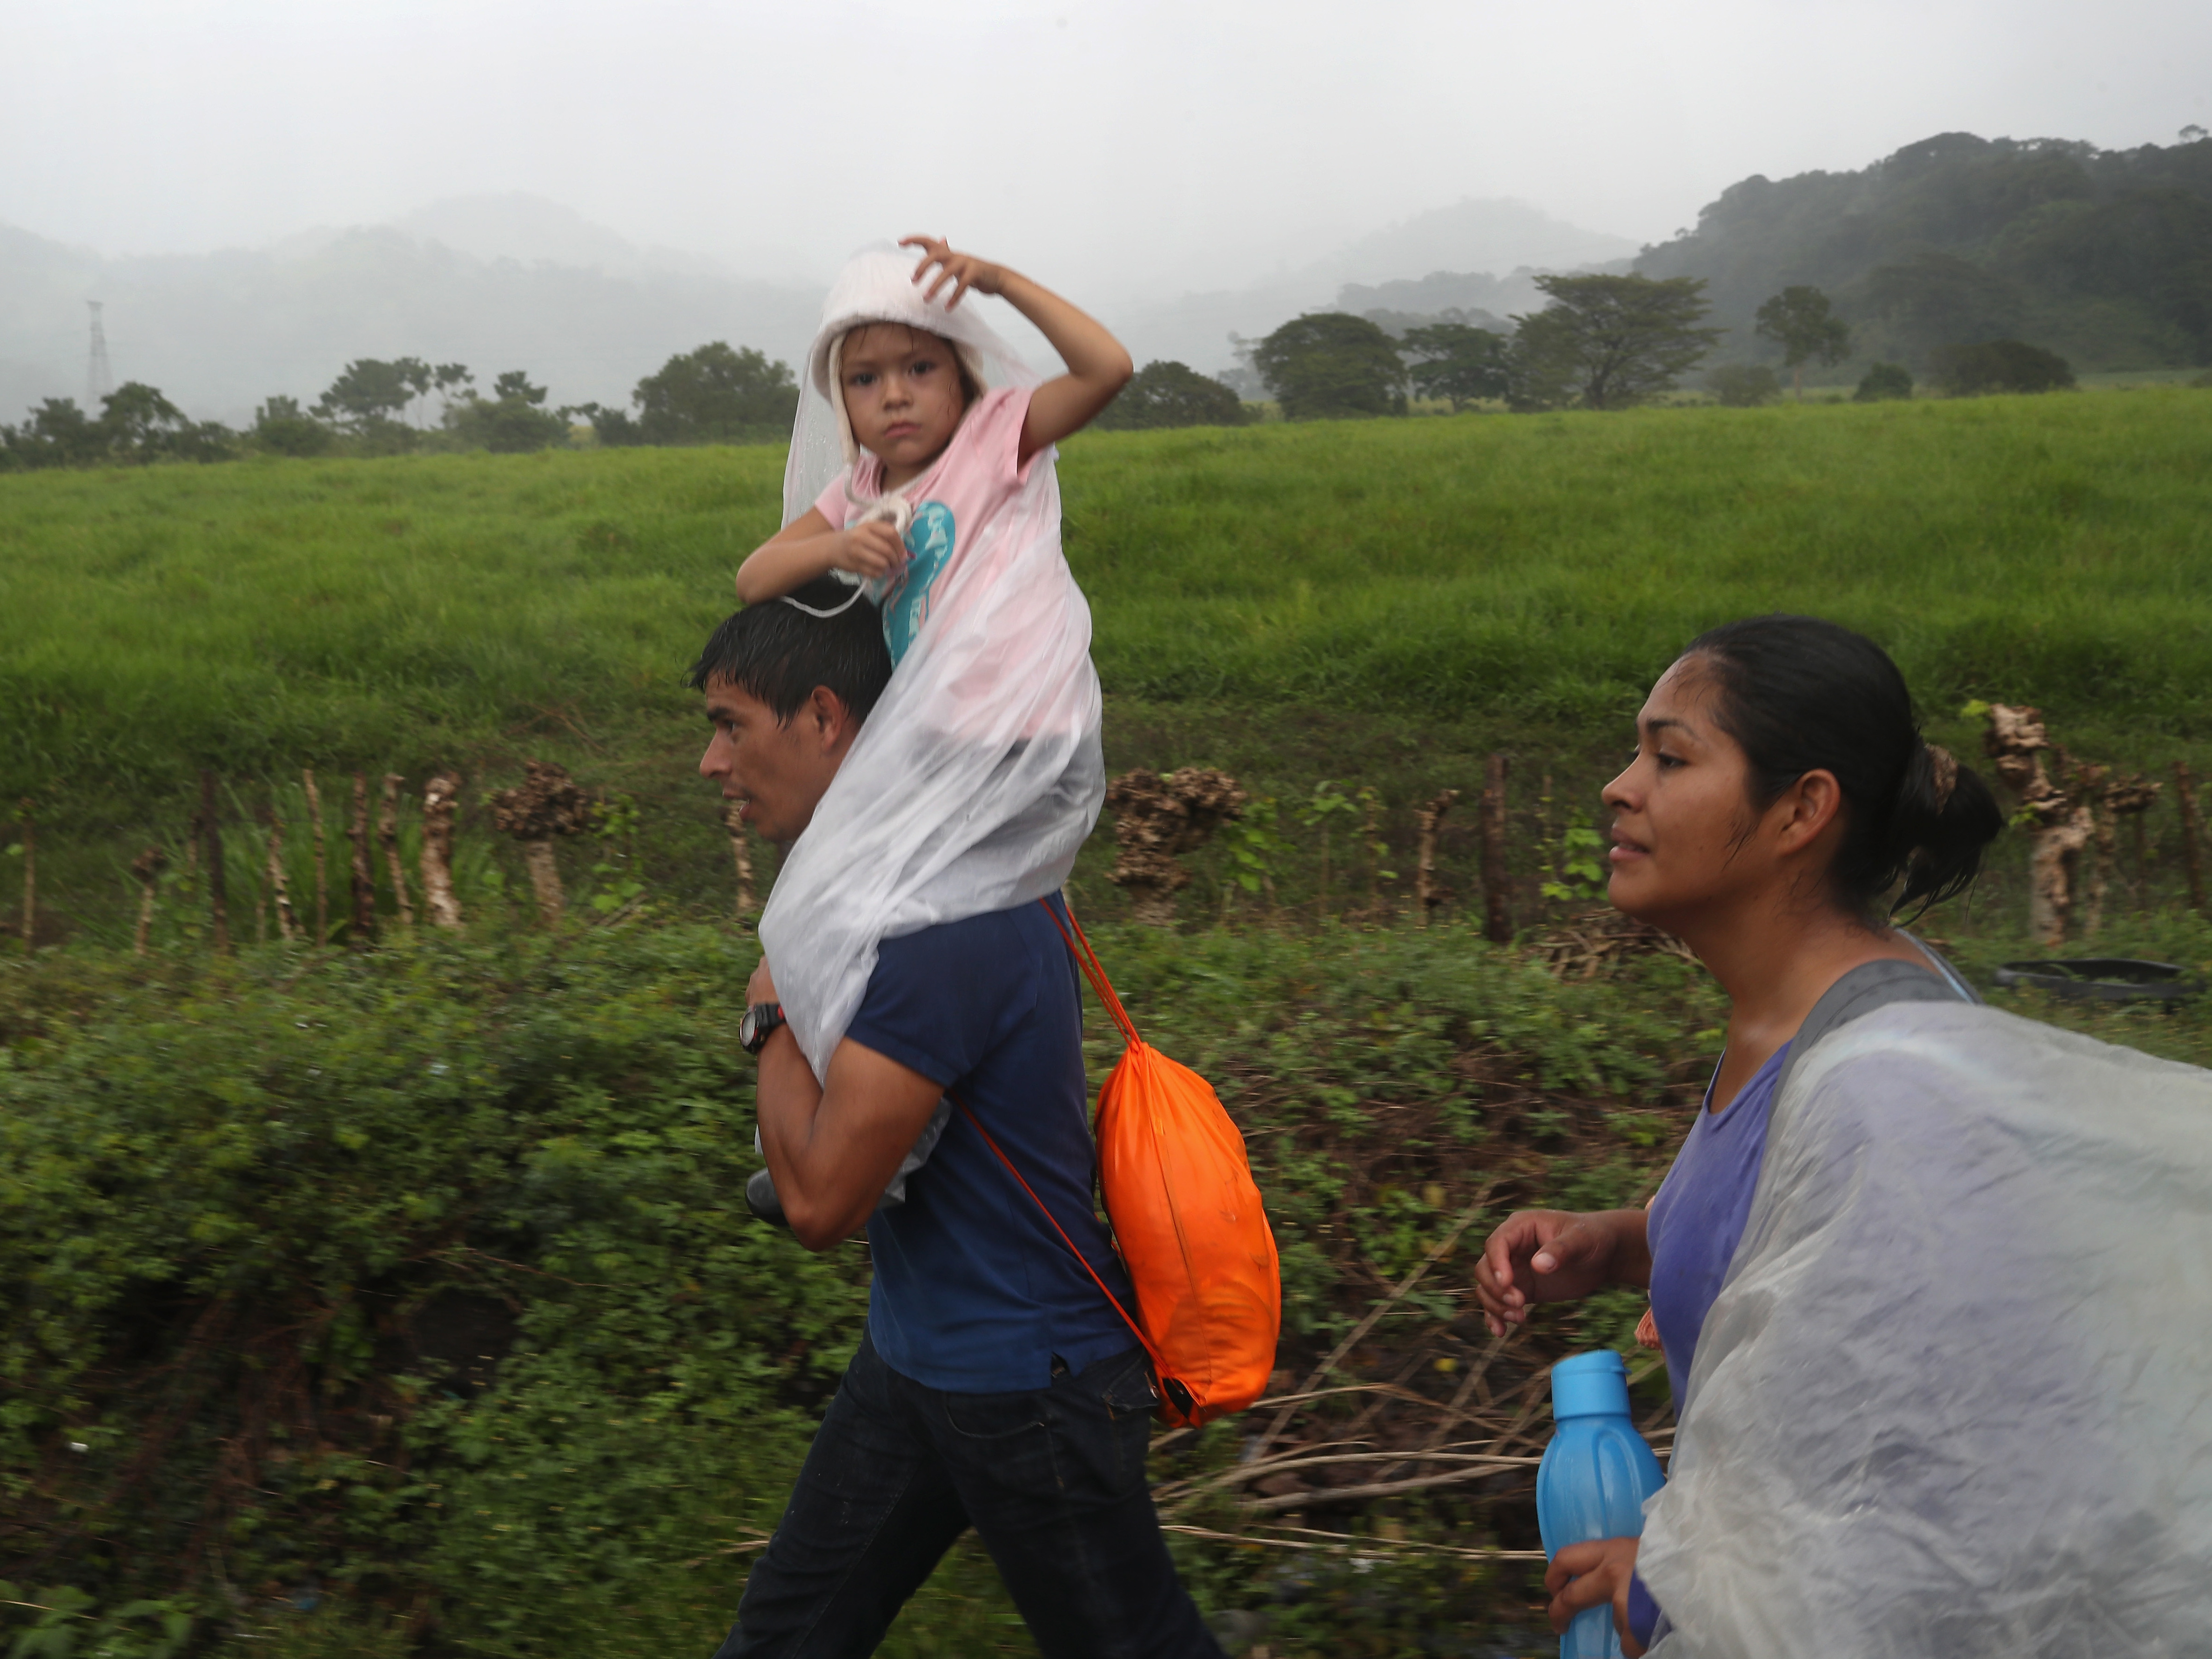 As Caravan Of Migrants Heads North, Trump Threatens To Close Southern U.S. Border